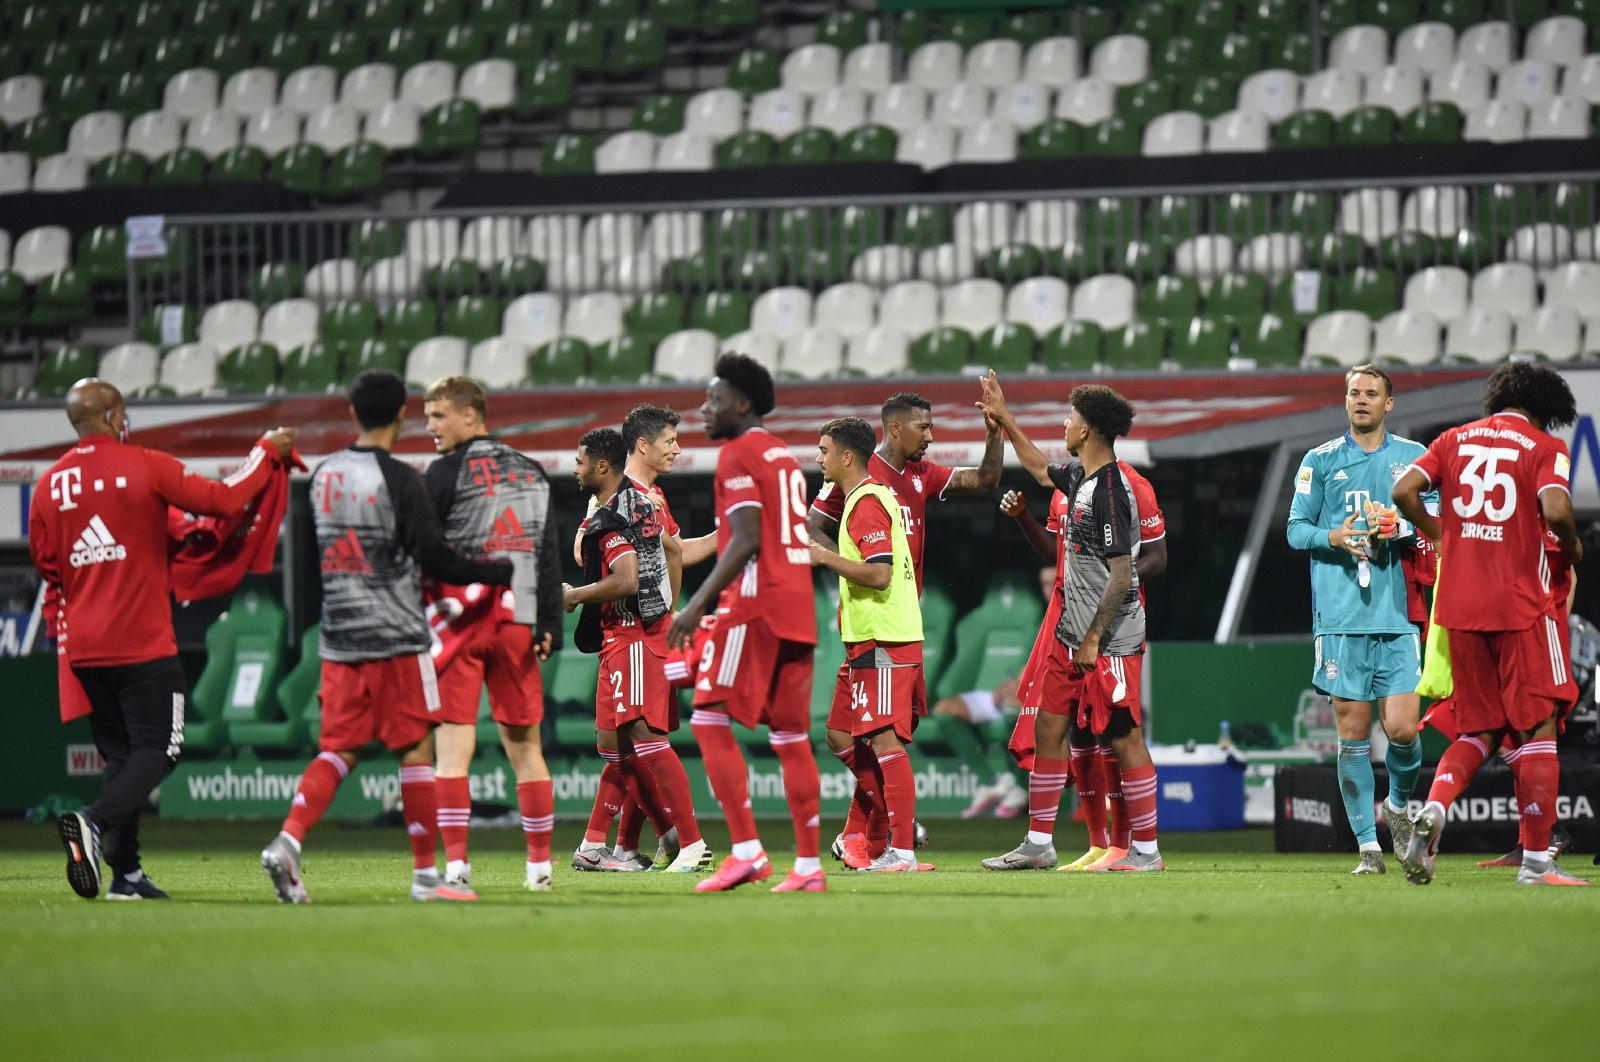 Bayern Munich's players celebrate end of the German Bundesliga football match between Werder Bremen and Bayern Munich in Bremen, Germany, Tuesday, June 16, 2020. (AP Photo)